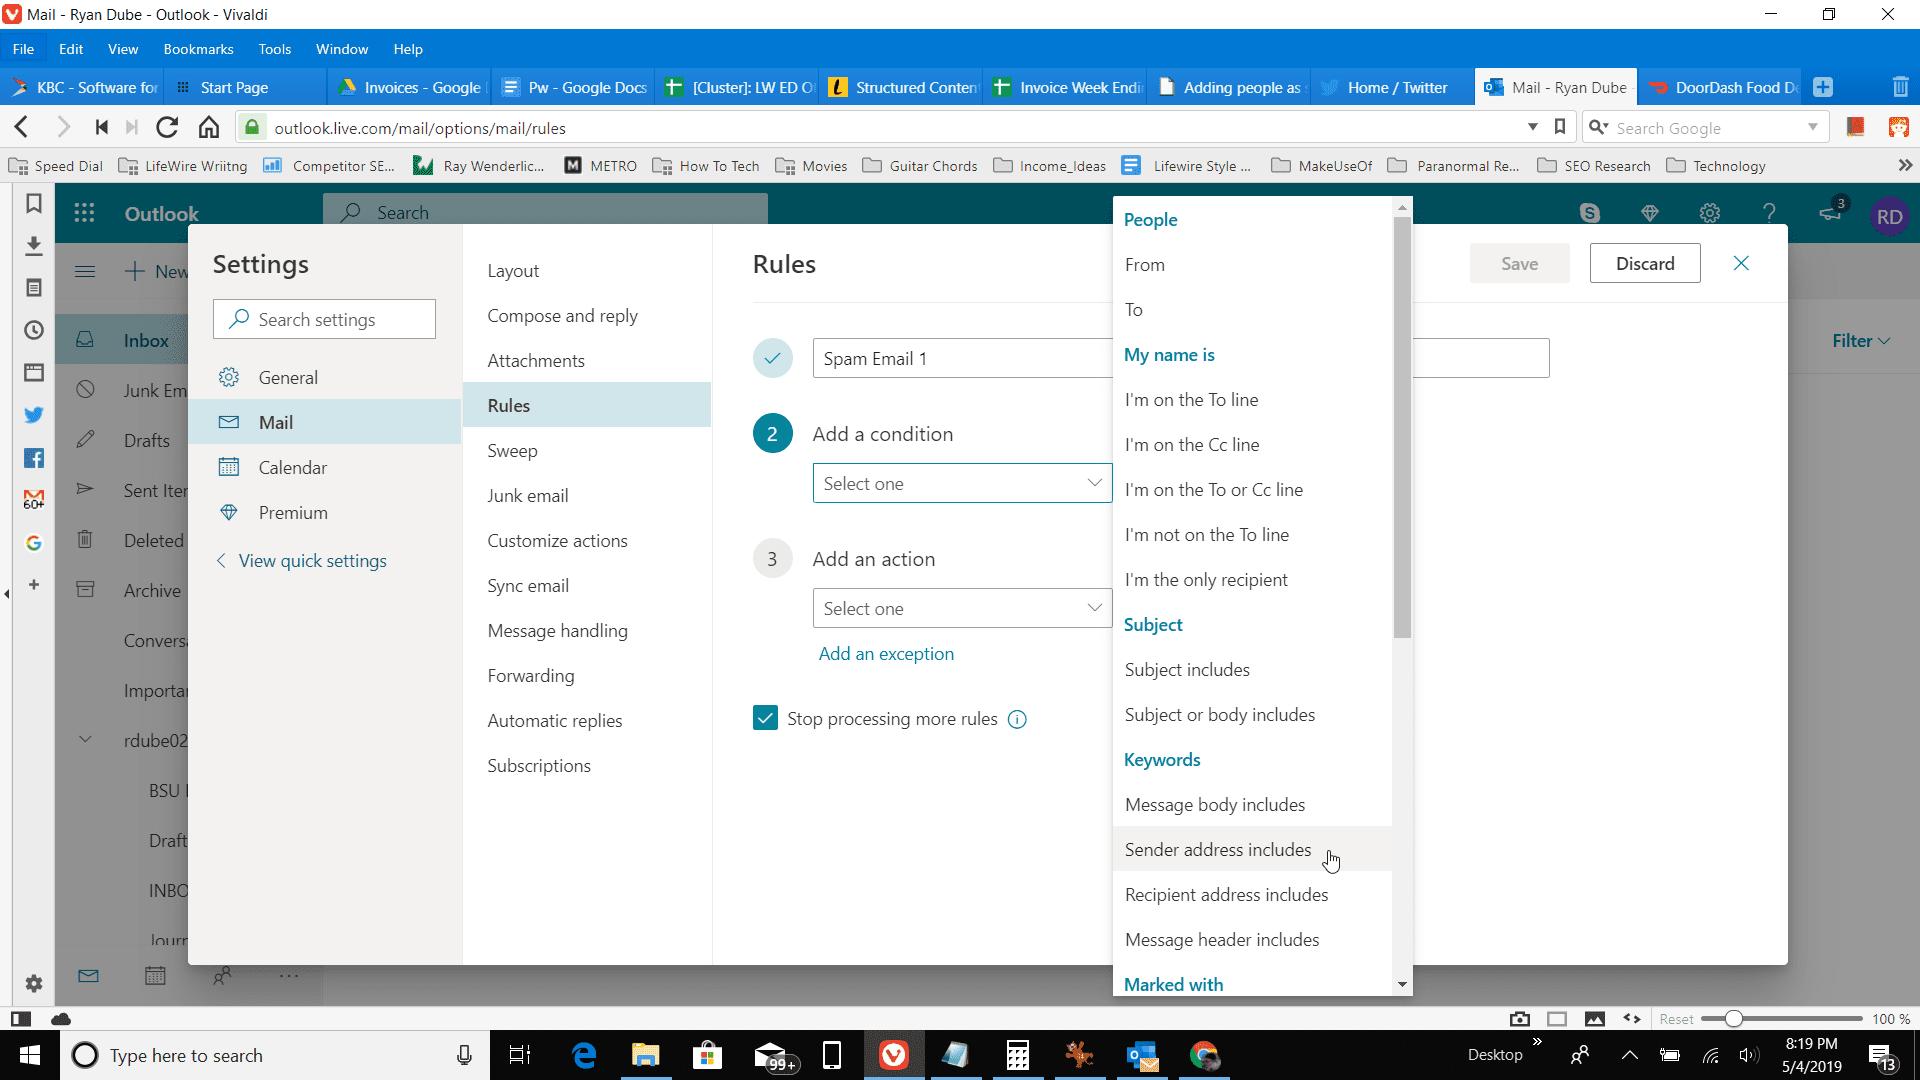 Screenshot of Sender address includes in Outlook online